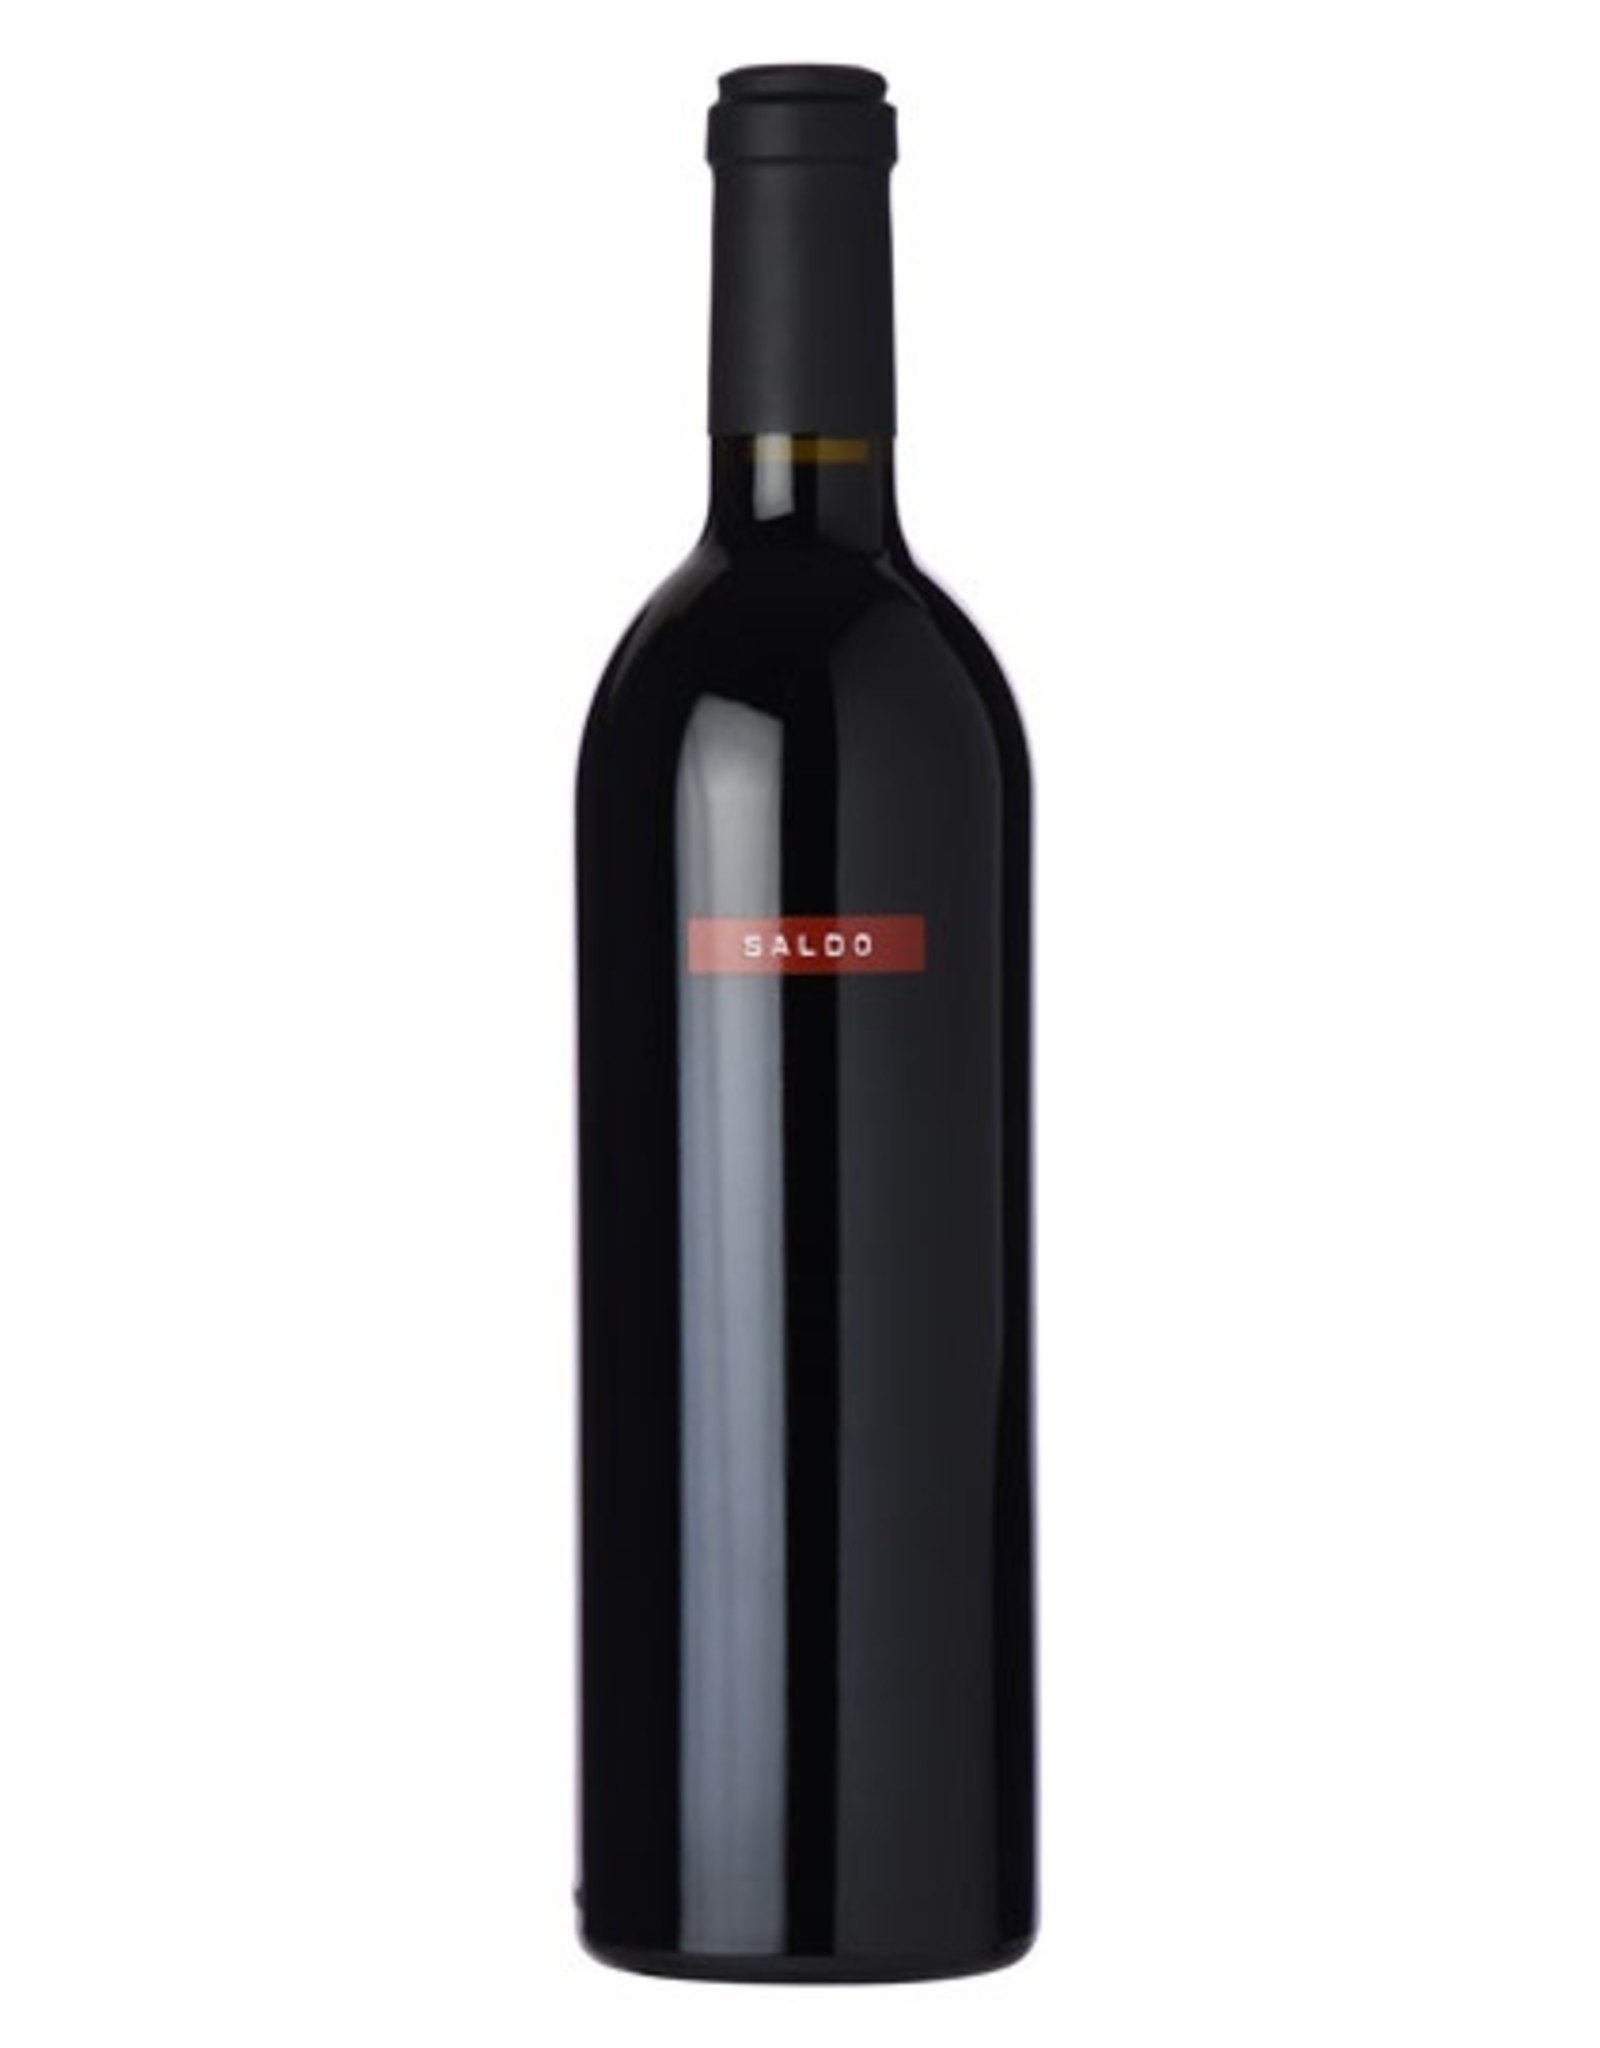 Red Wine 2019, Prisoner Wine Co. Saldo, Zinfandel, Multi-regional Blend, Multiple AVA, California, 15.9% Alc, CT89, TW89